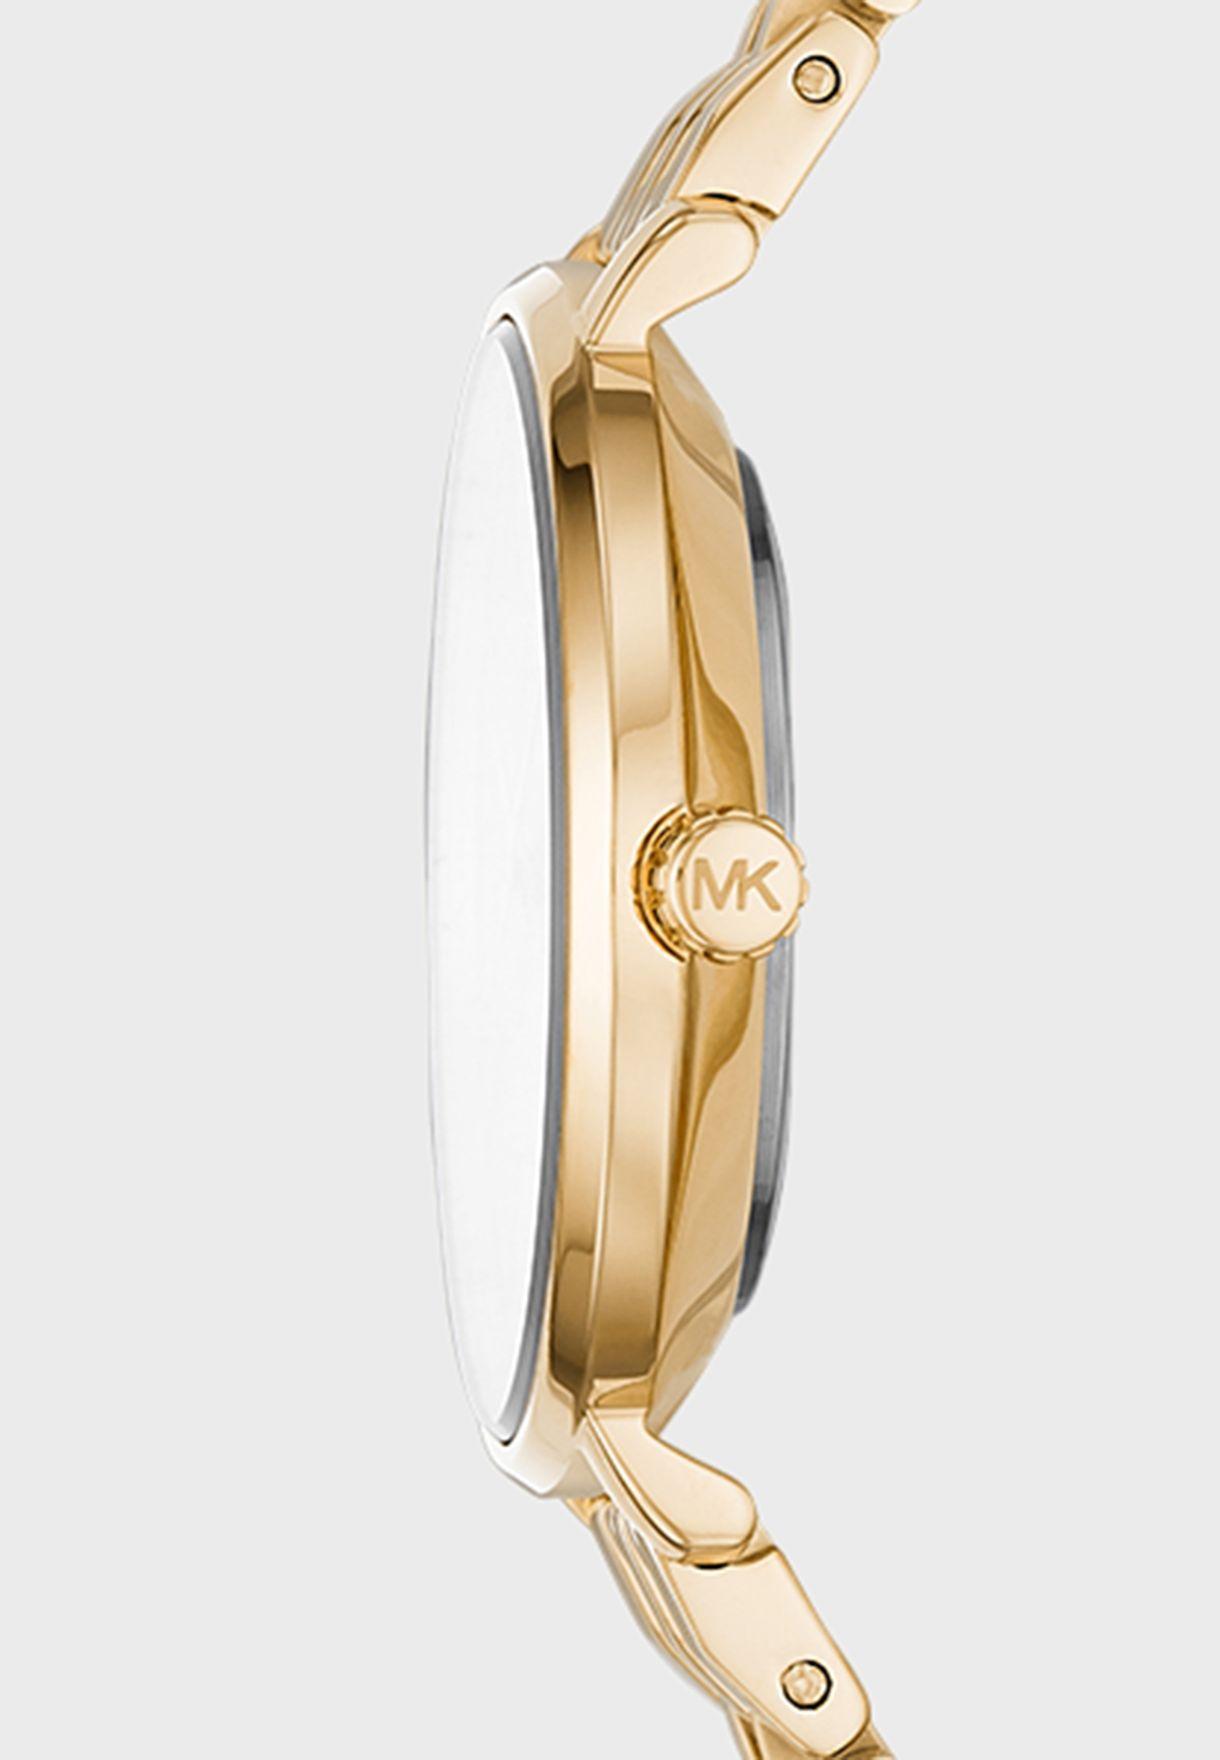 Steel Strap Analog Watch + Bracelet gift set